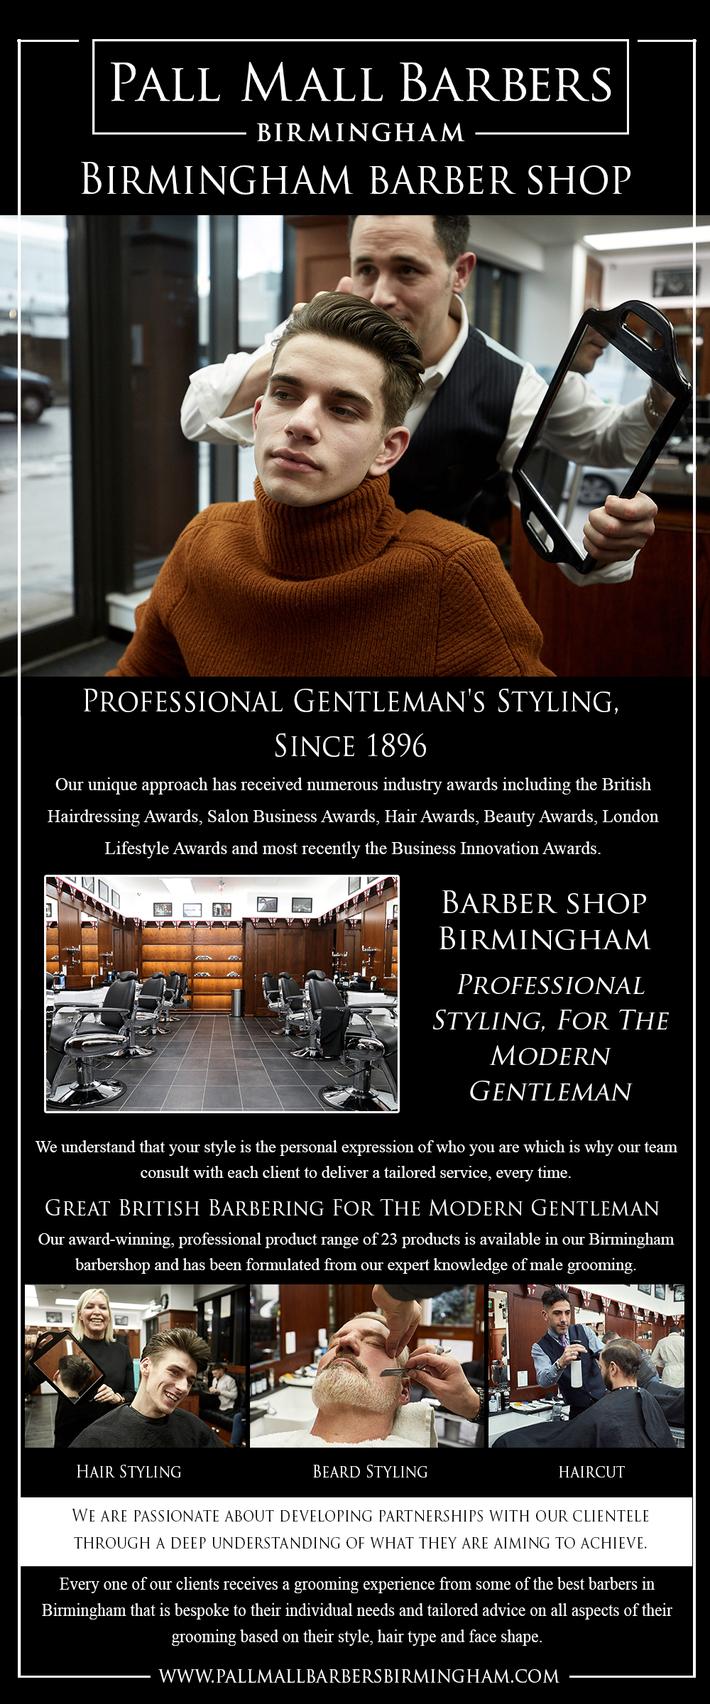 Birmingham Barber Shop | Call 01217941693 | pallmallbarbersbirmingham.com